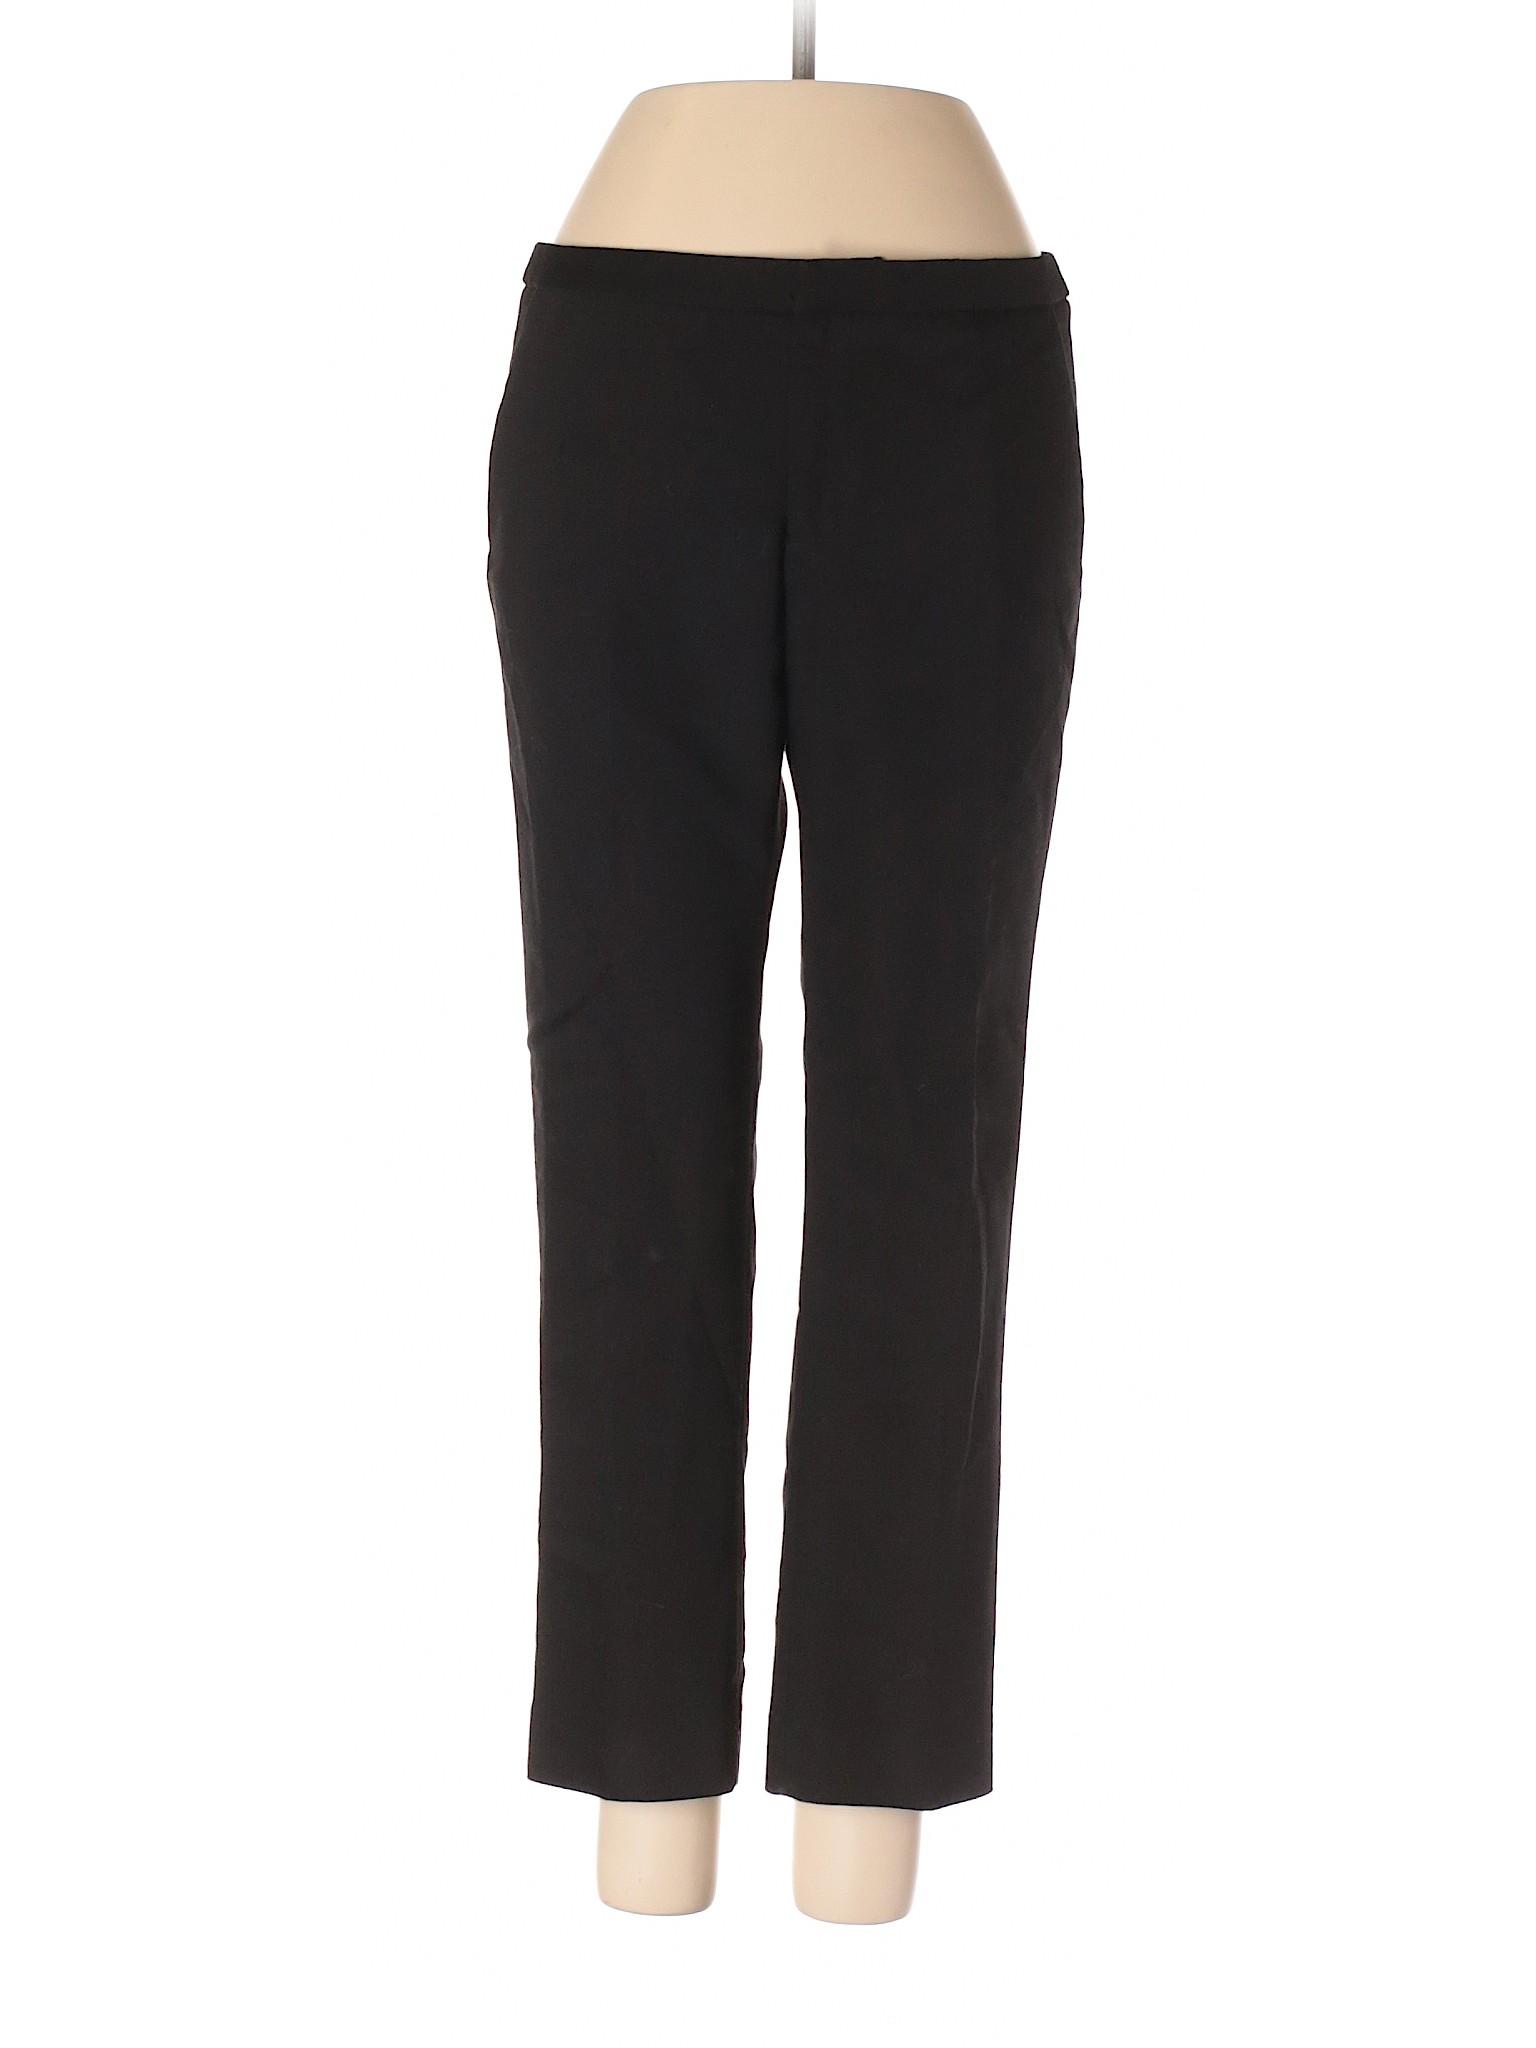 Pants winter Dress Boutique Zara Basic TqIwWXRU